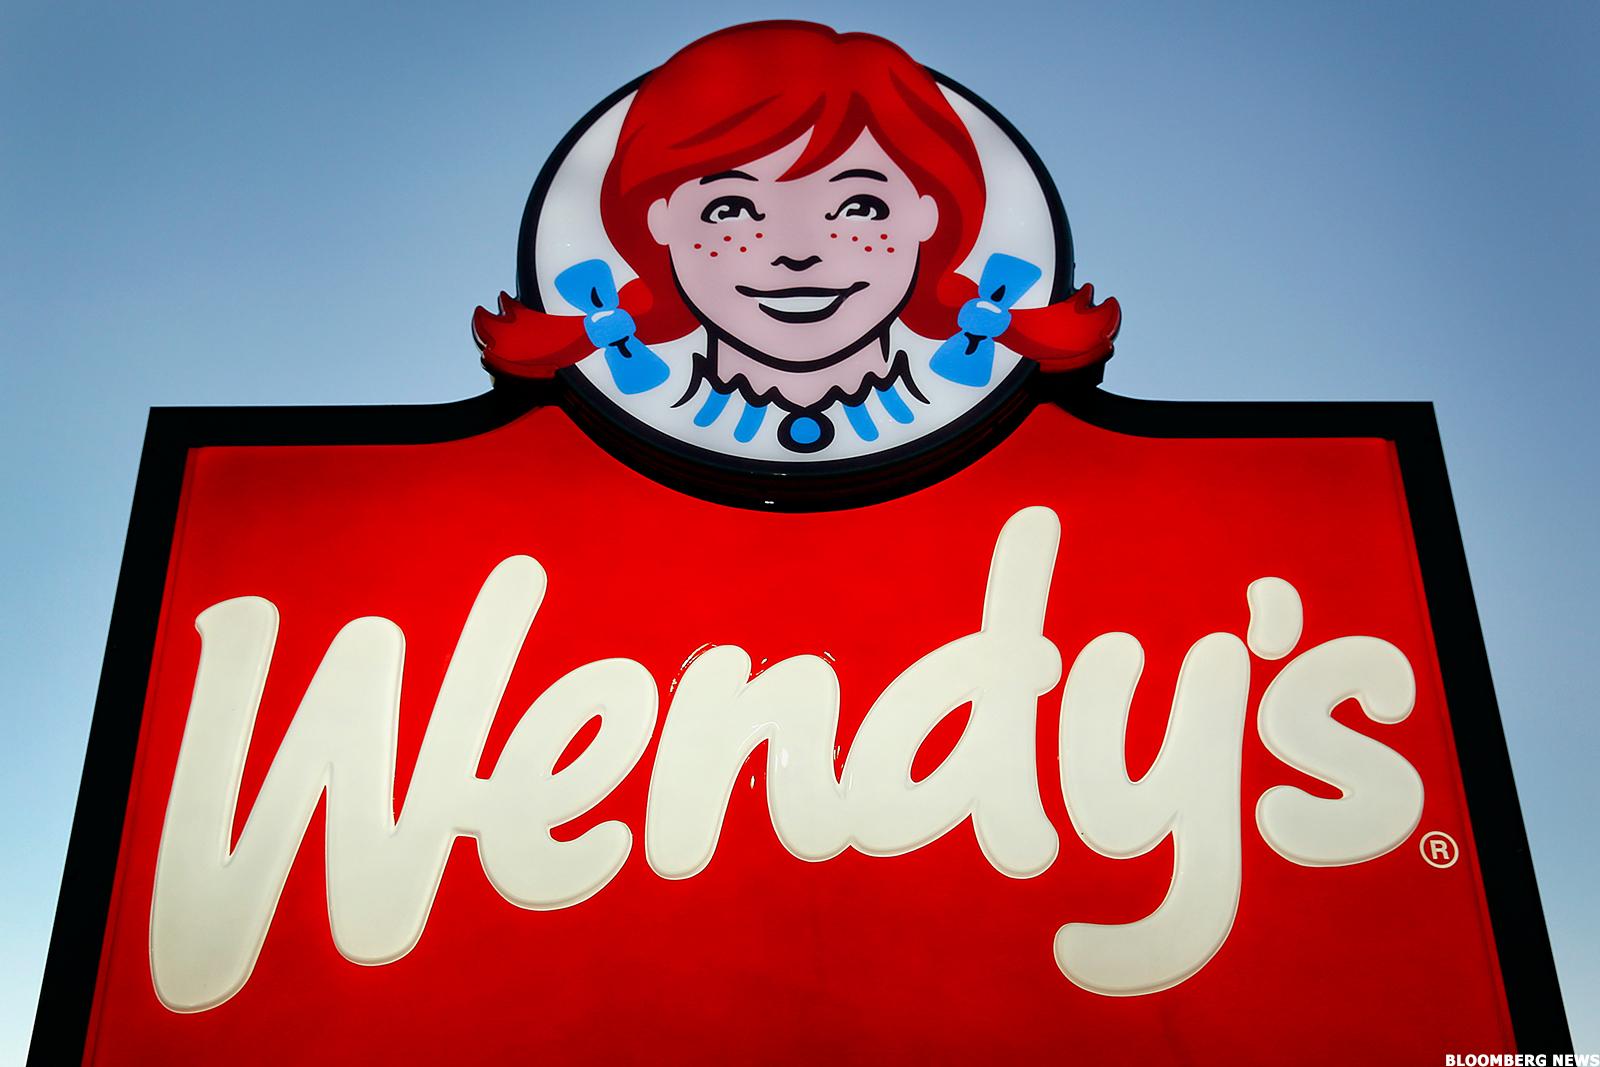 Wendy's (WEN) Stock Slides on Q2 Sales Growth - TheStreet